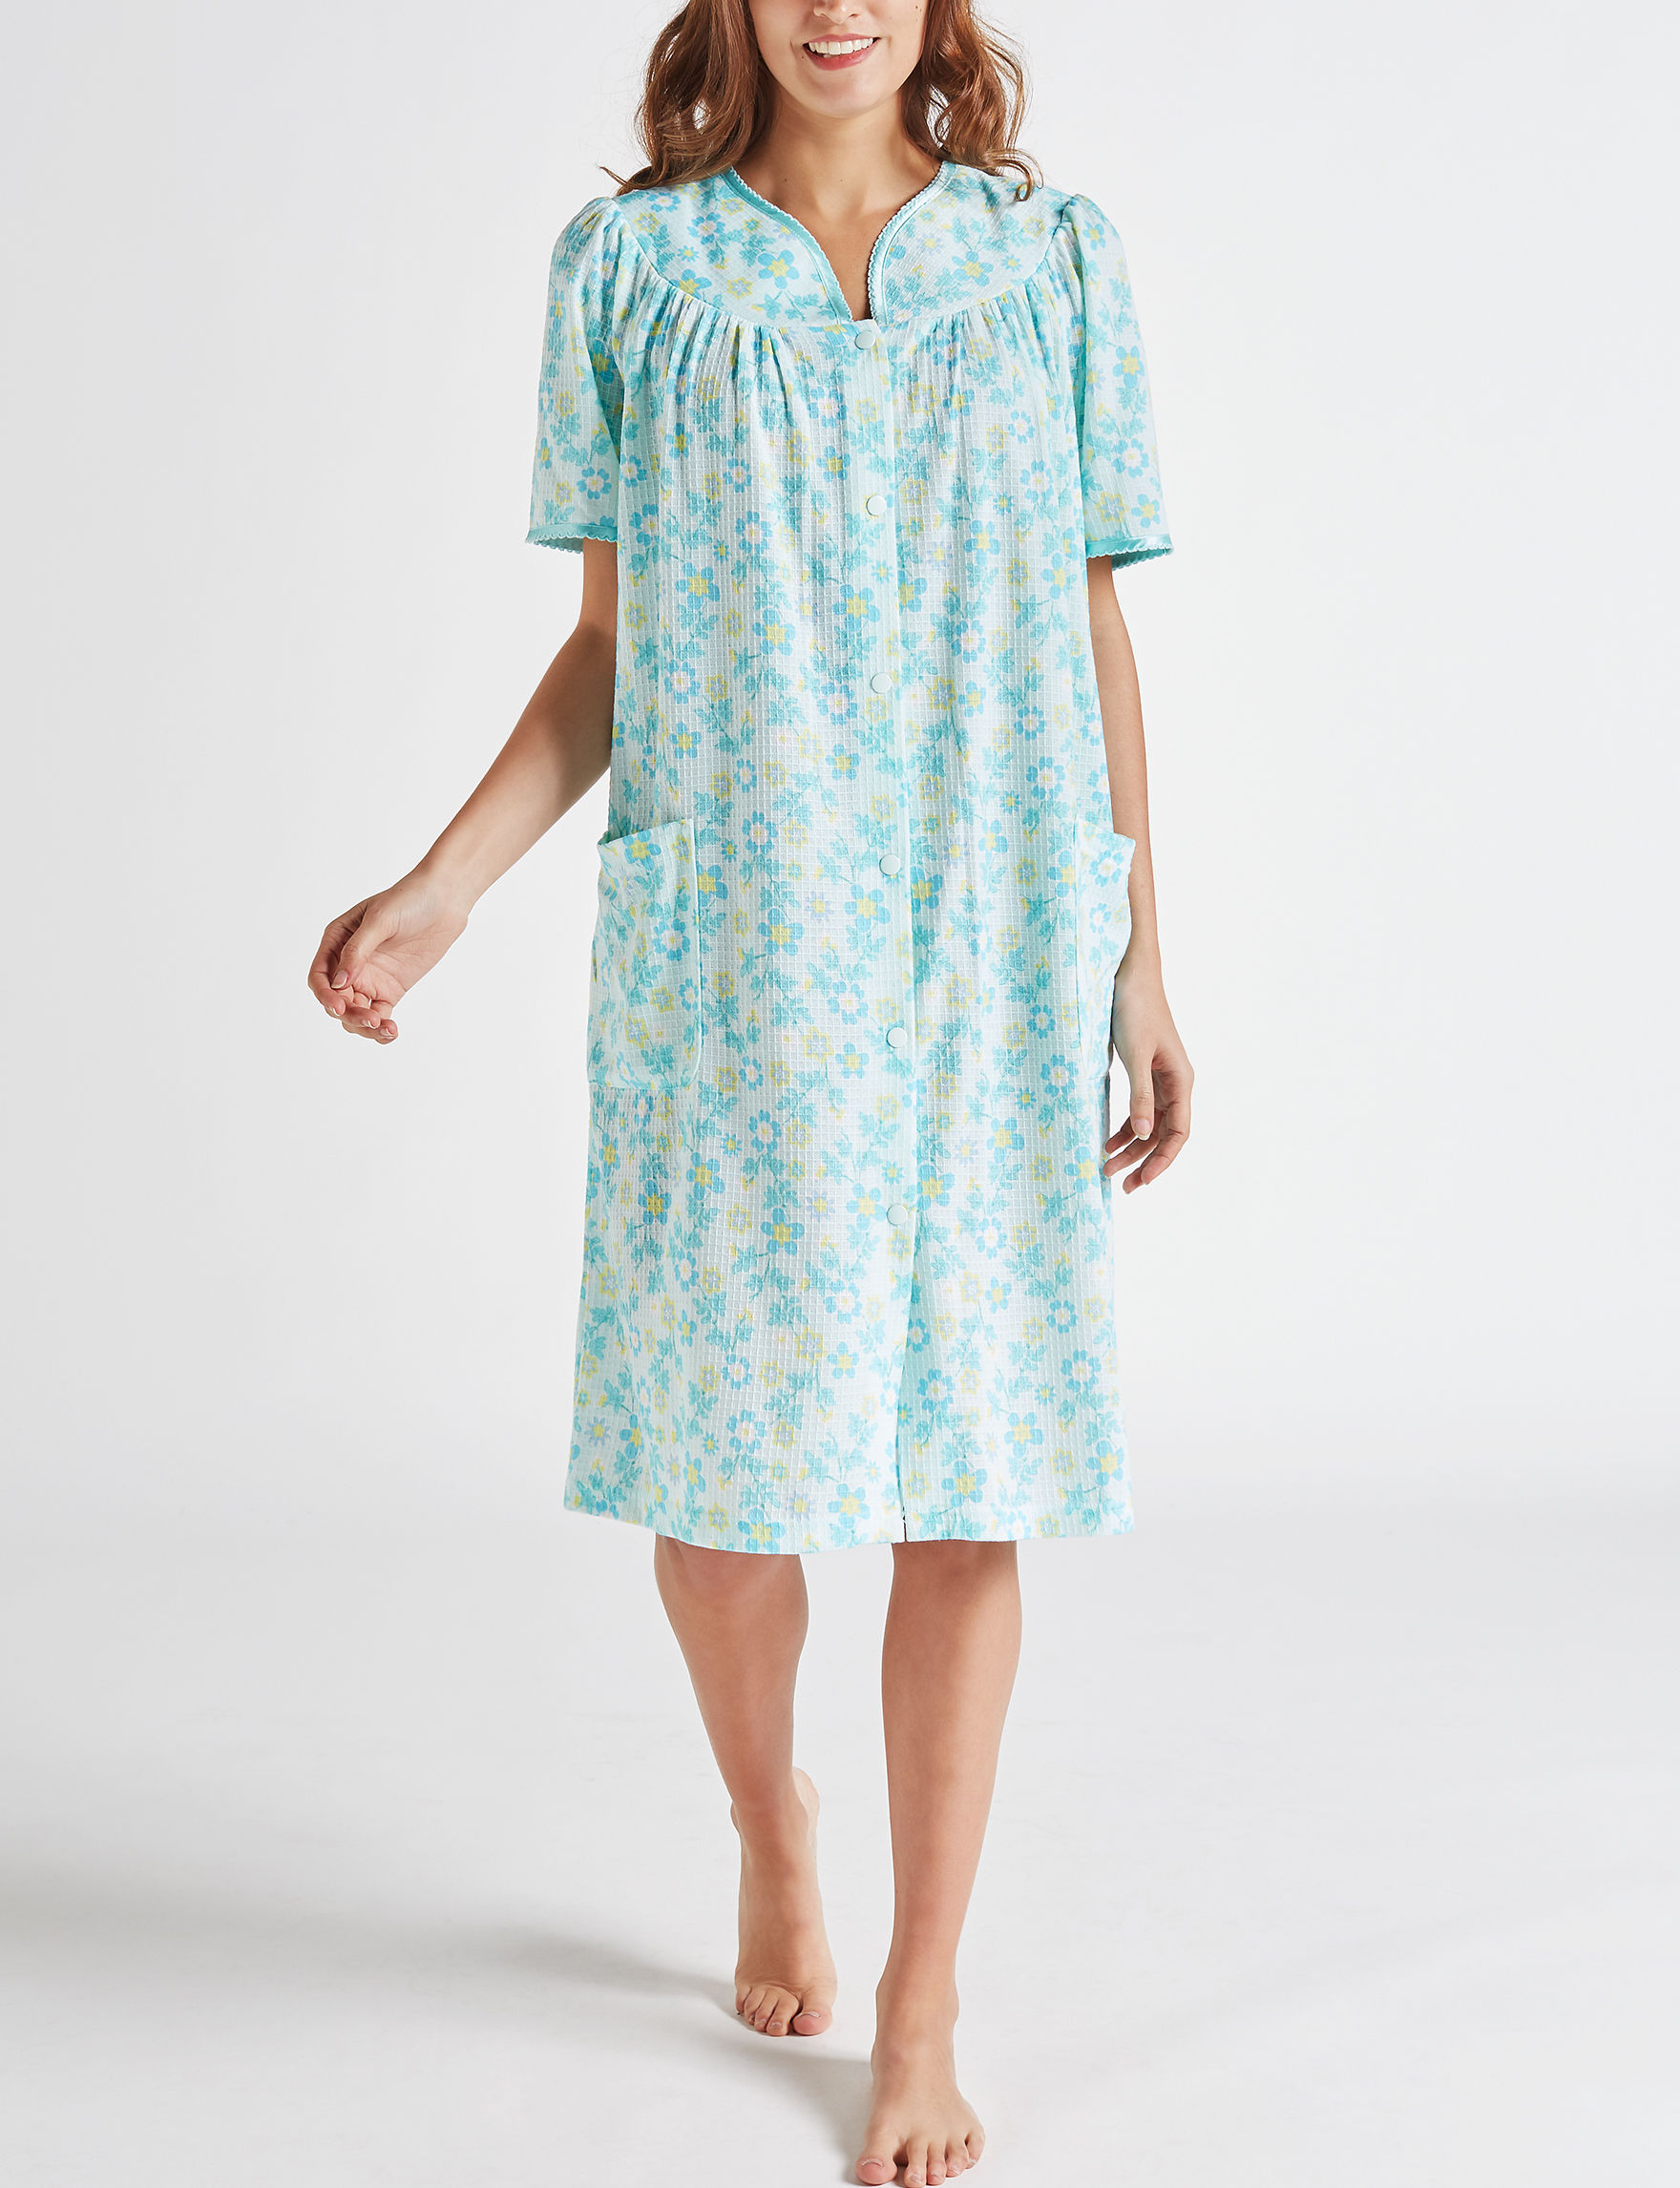 Jasmine Rose Light Blue Robes, Wraps & Dusters